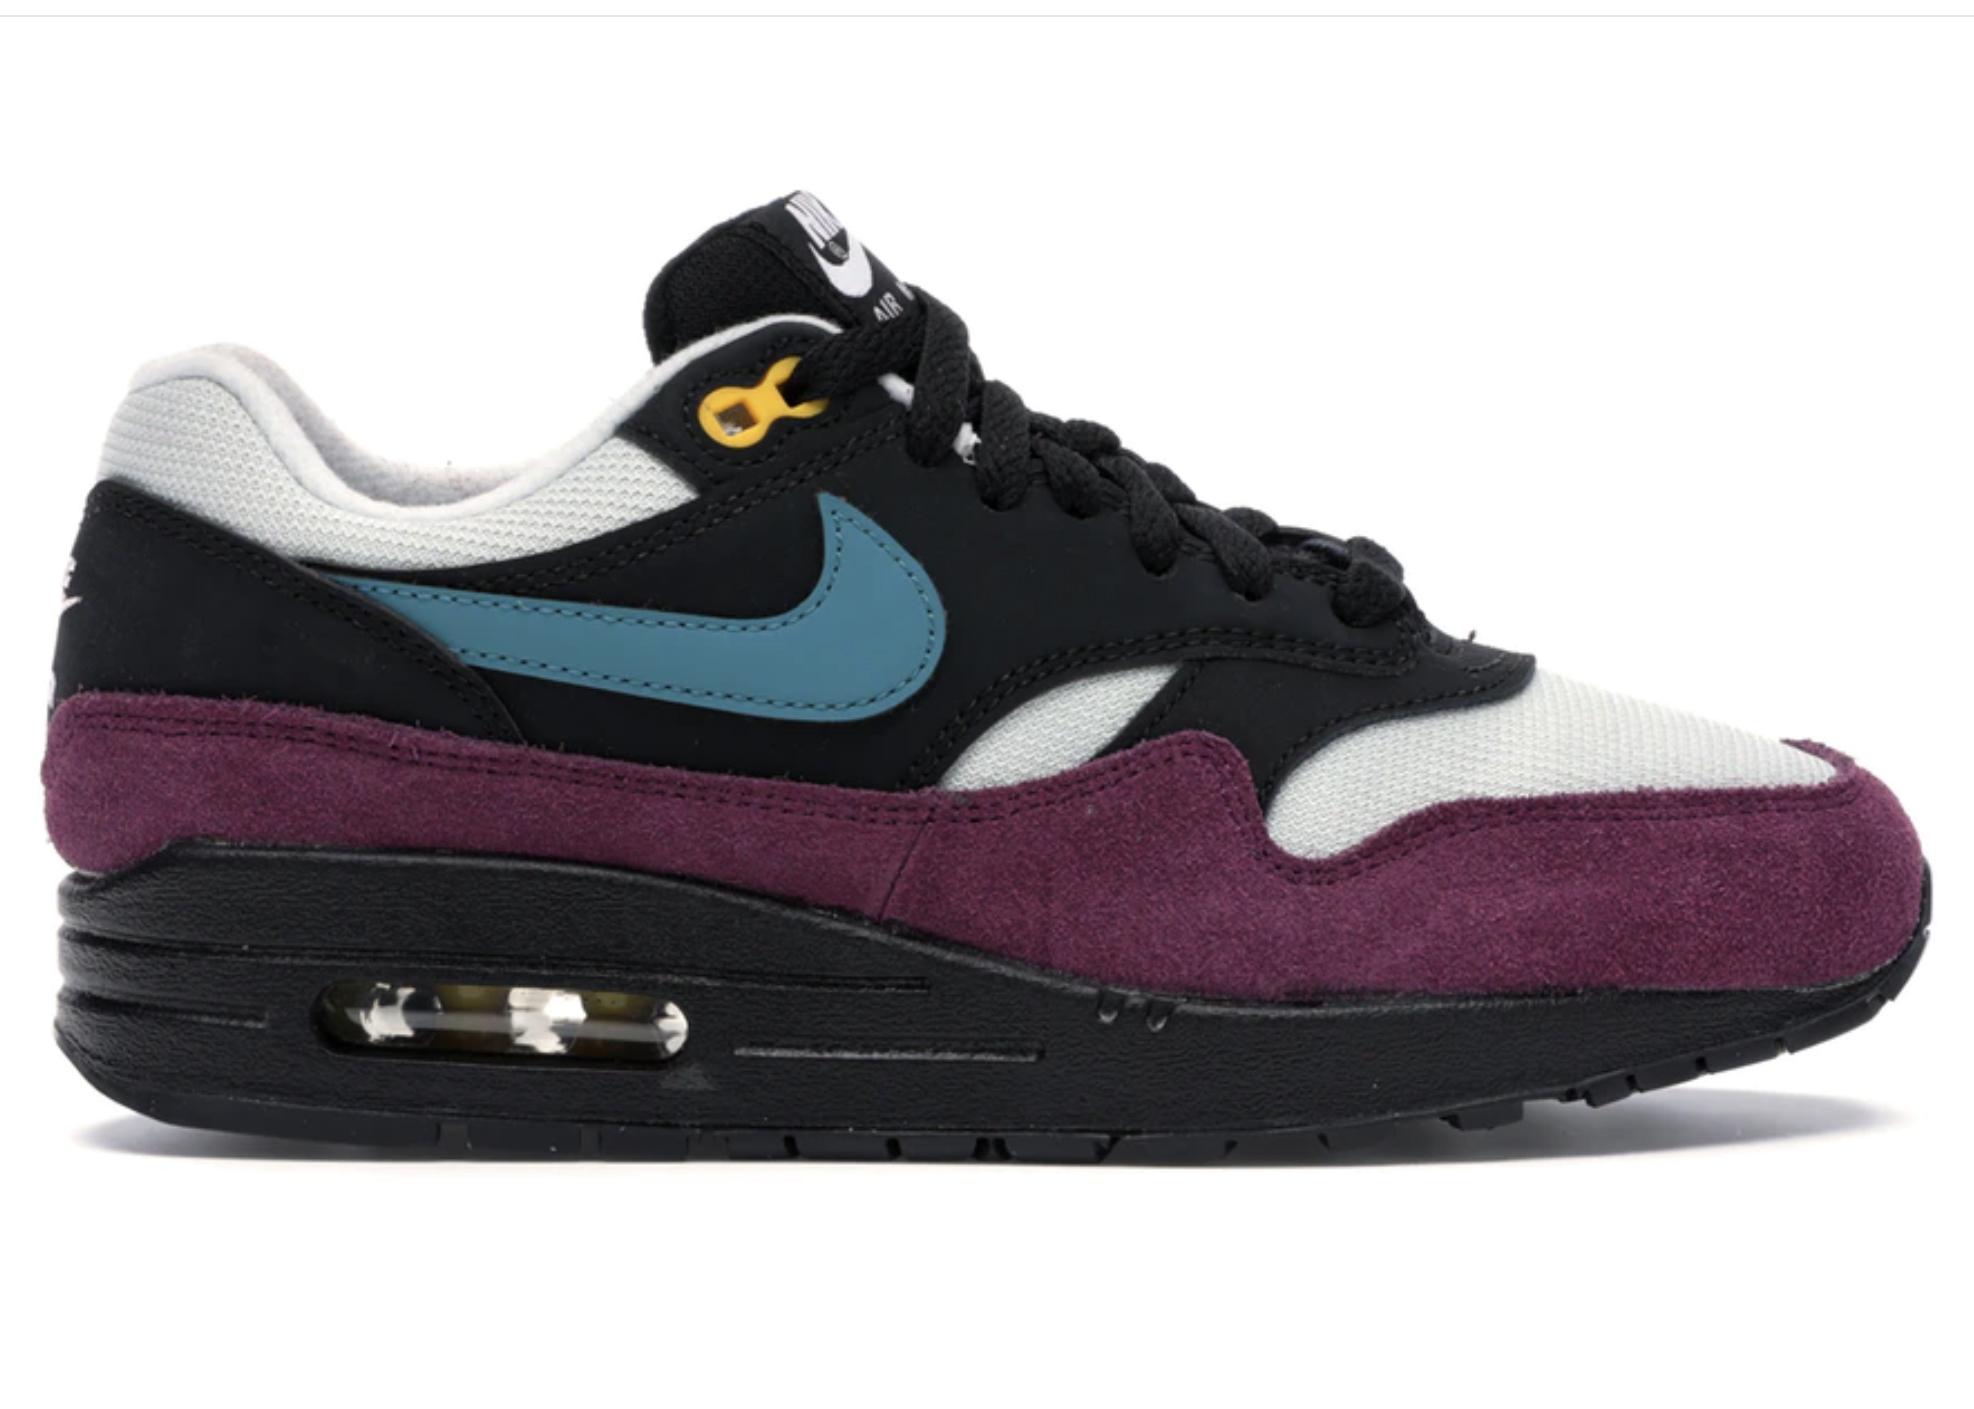 Nike Air Max 1 Golf Black Geode Teal (W